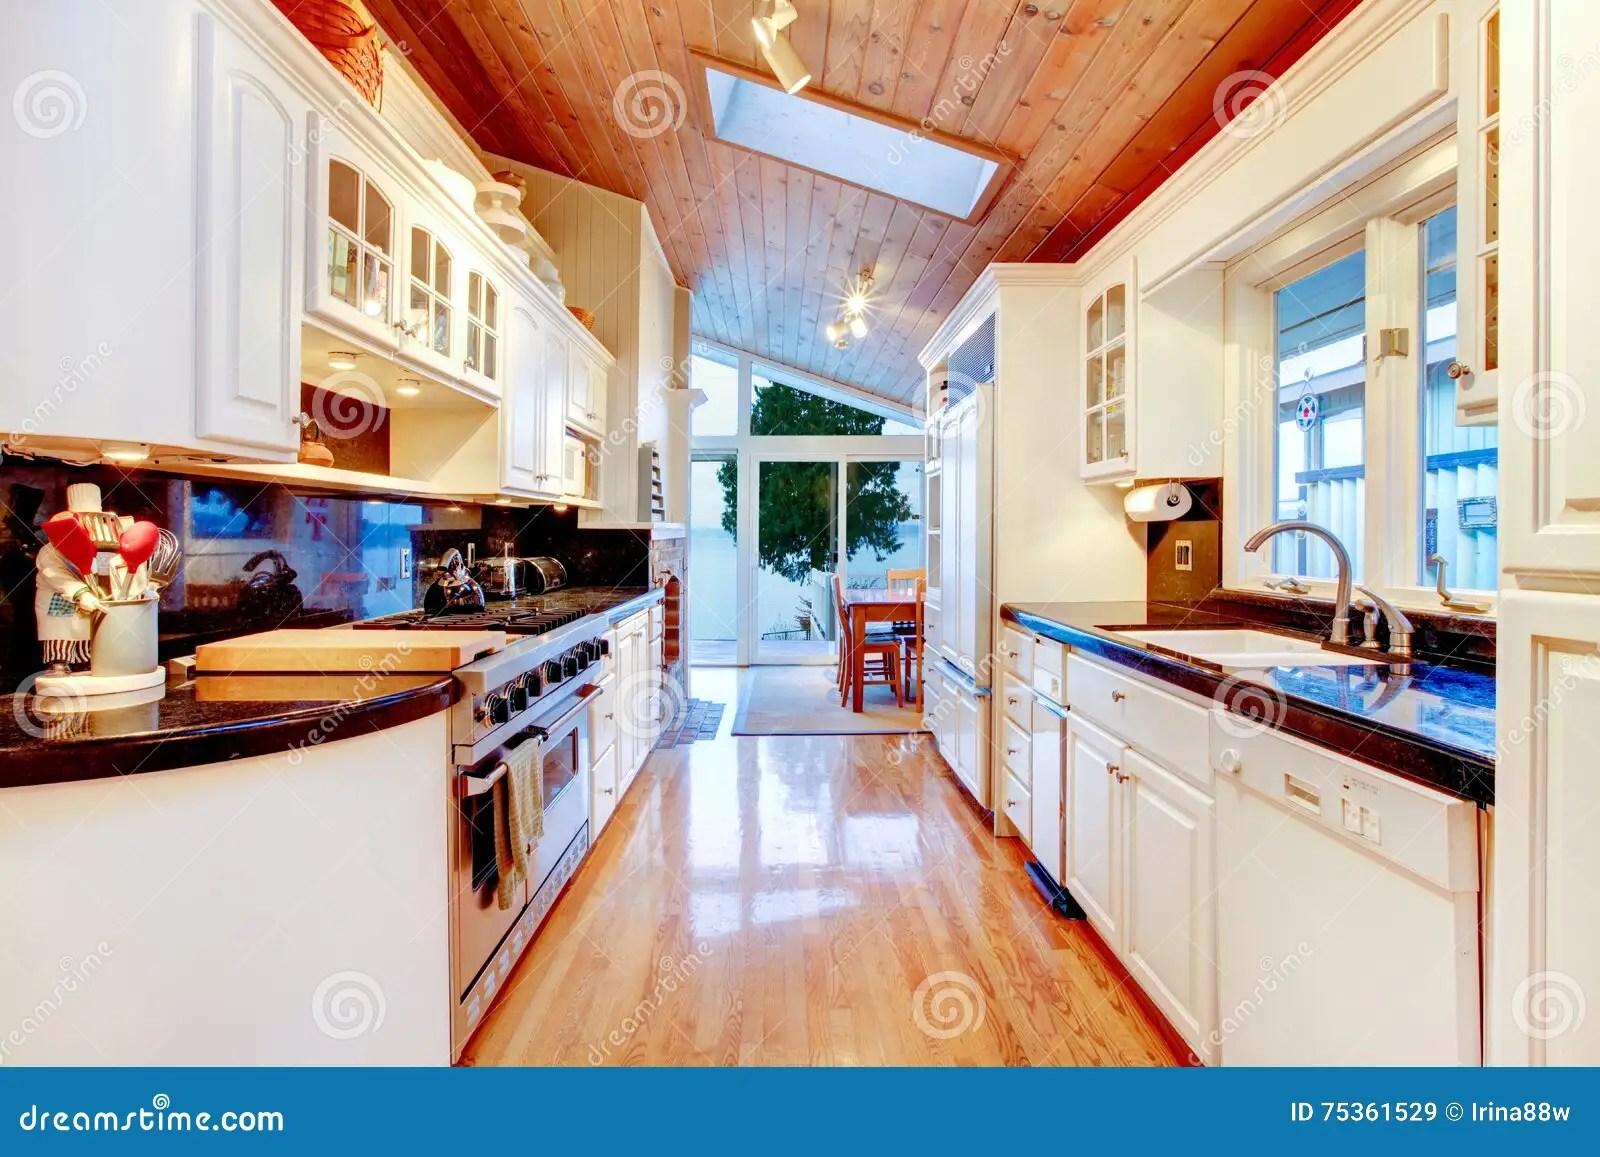 kitchen cabinets ri commercial sink drain parts 有黑桌面的白色厨柜在豪华房子里库存图片 图片包括有冰箱 硬木 任何 有黑桌面 发光的硬木地板和木天花板的白色厨柜与在豪华房子内部的天窗西北 美国